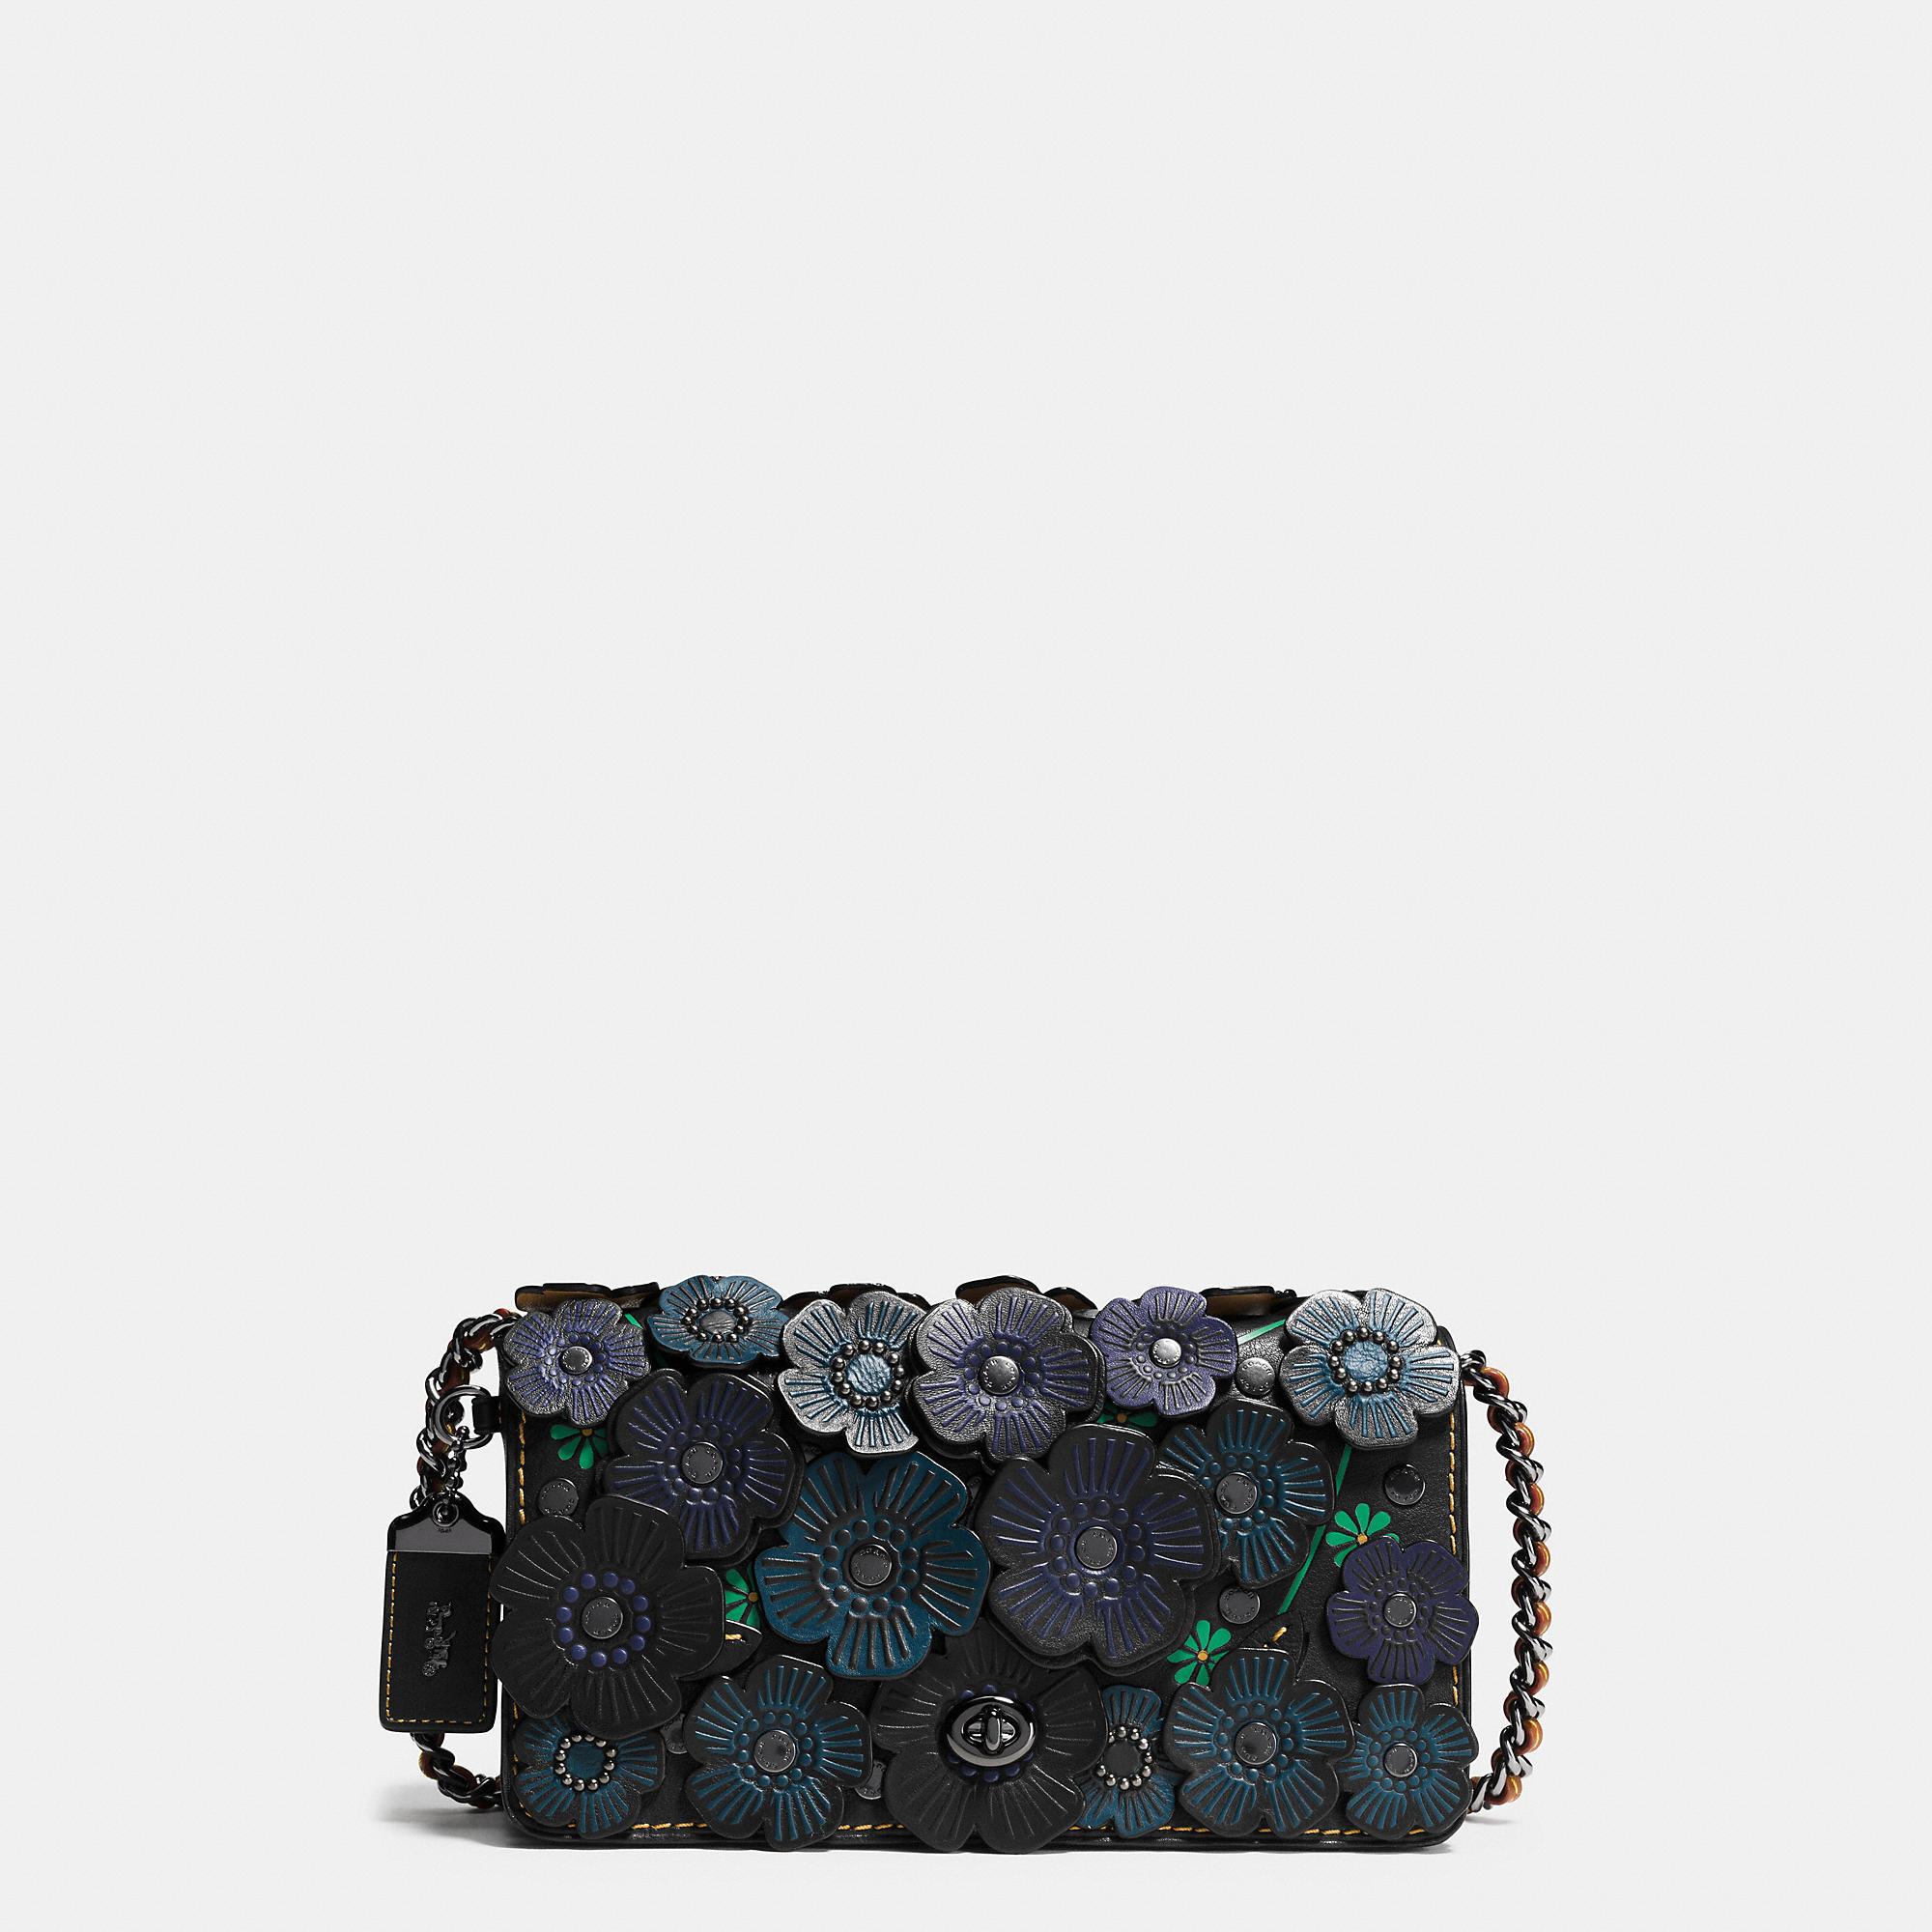 cheap coach black rose appliqué dinky bag lyst. view fullscreen e0967  eff08  clearance coach tea rose applique dinky crossbody in leather lyst  be9a3 21eb4 6b3eee638dc7e